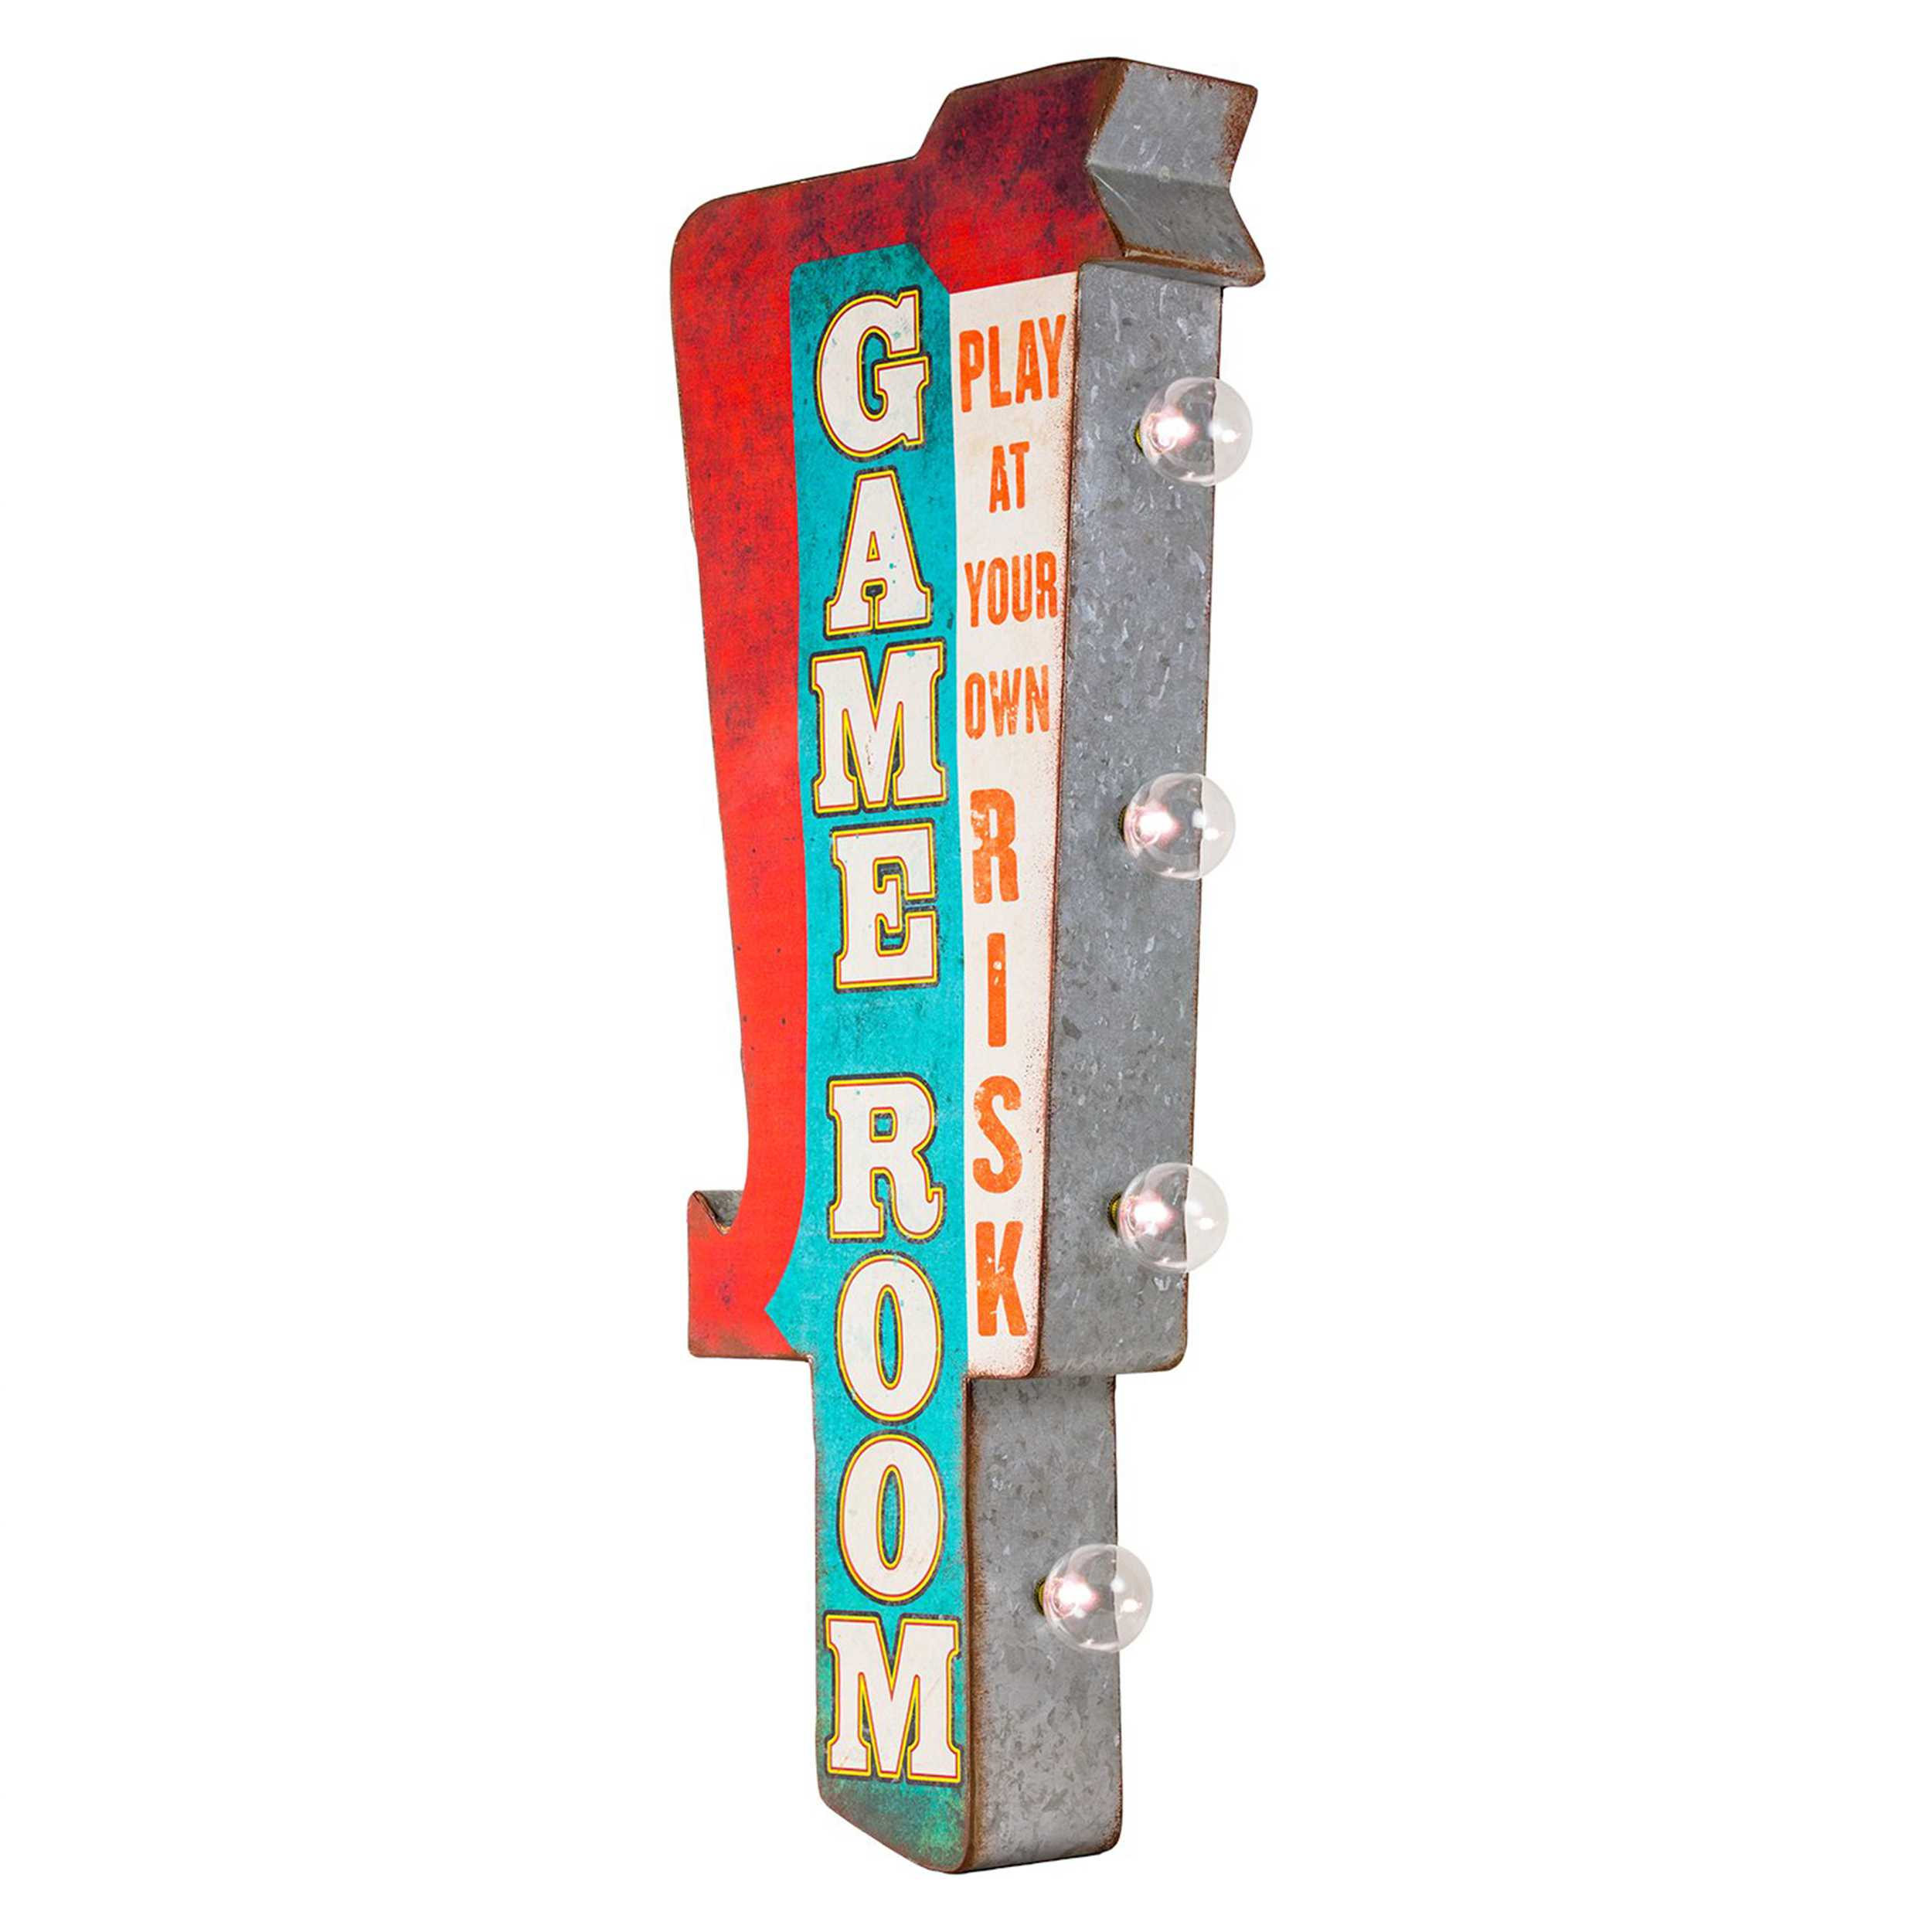 Vintage Two Sided Led Sign - Game Room